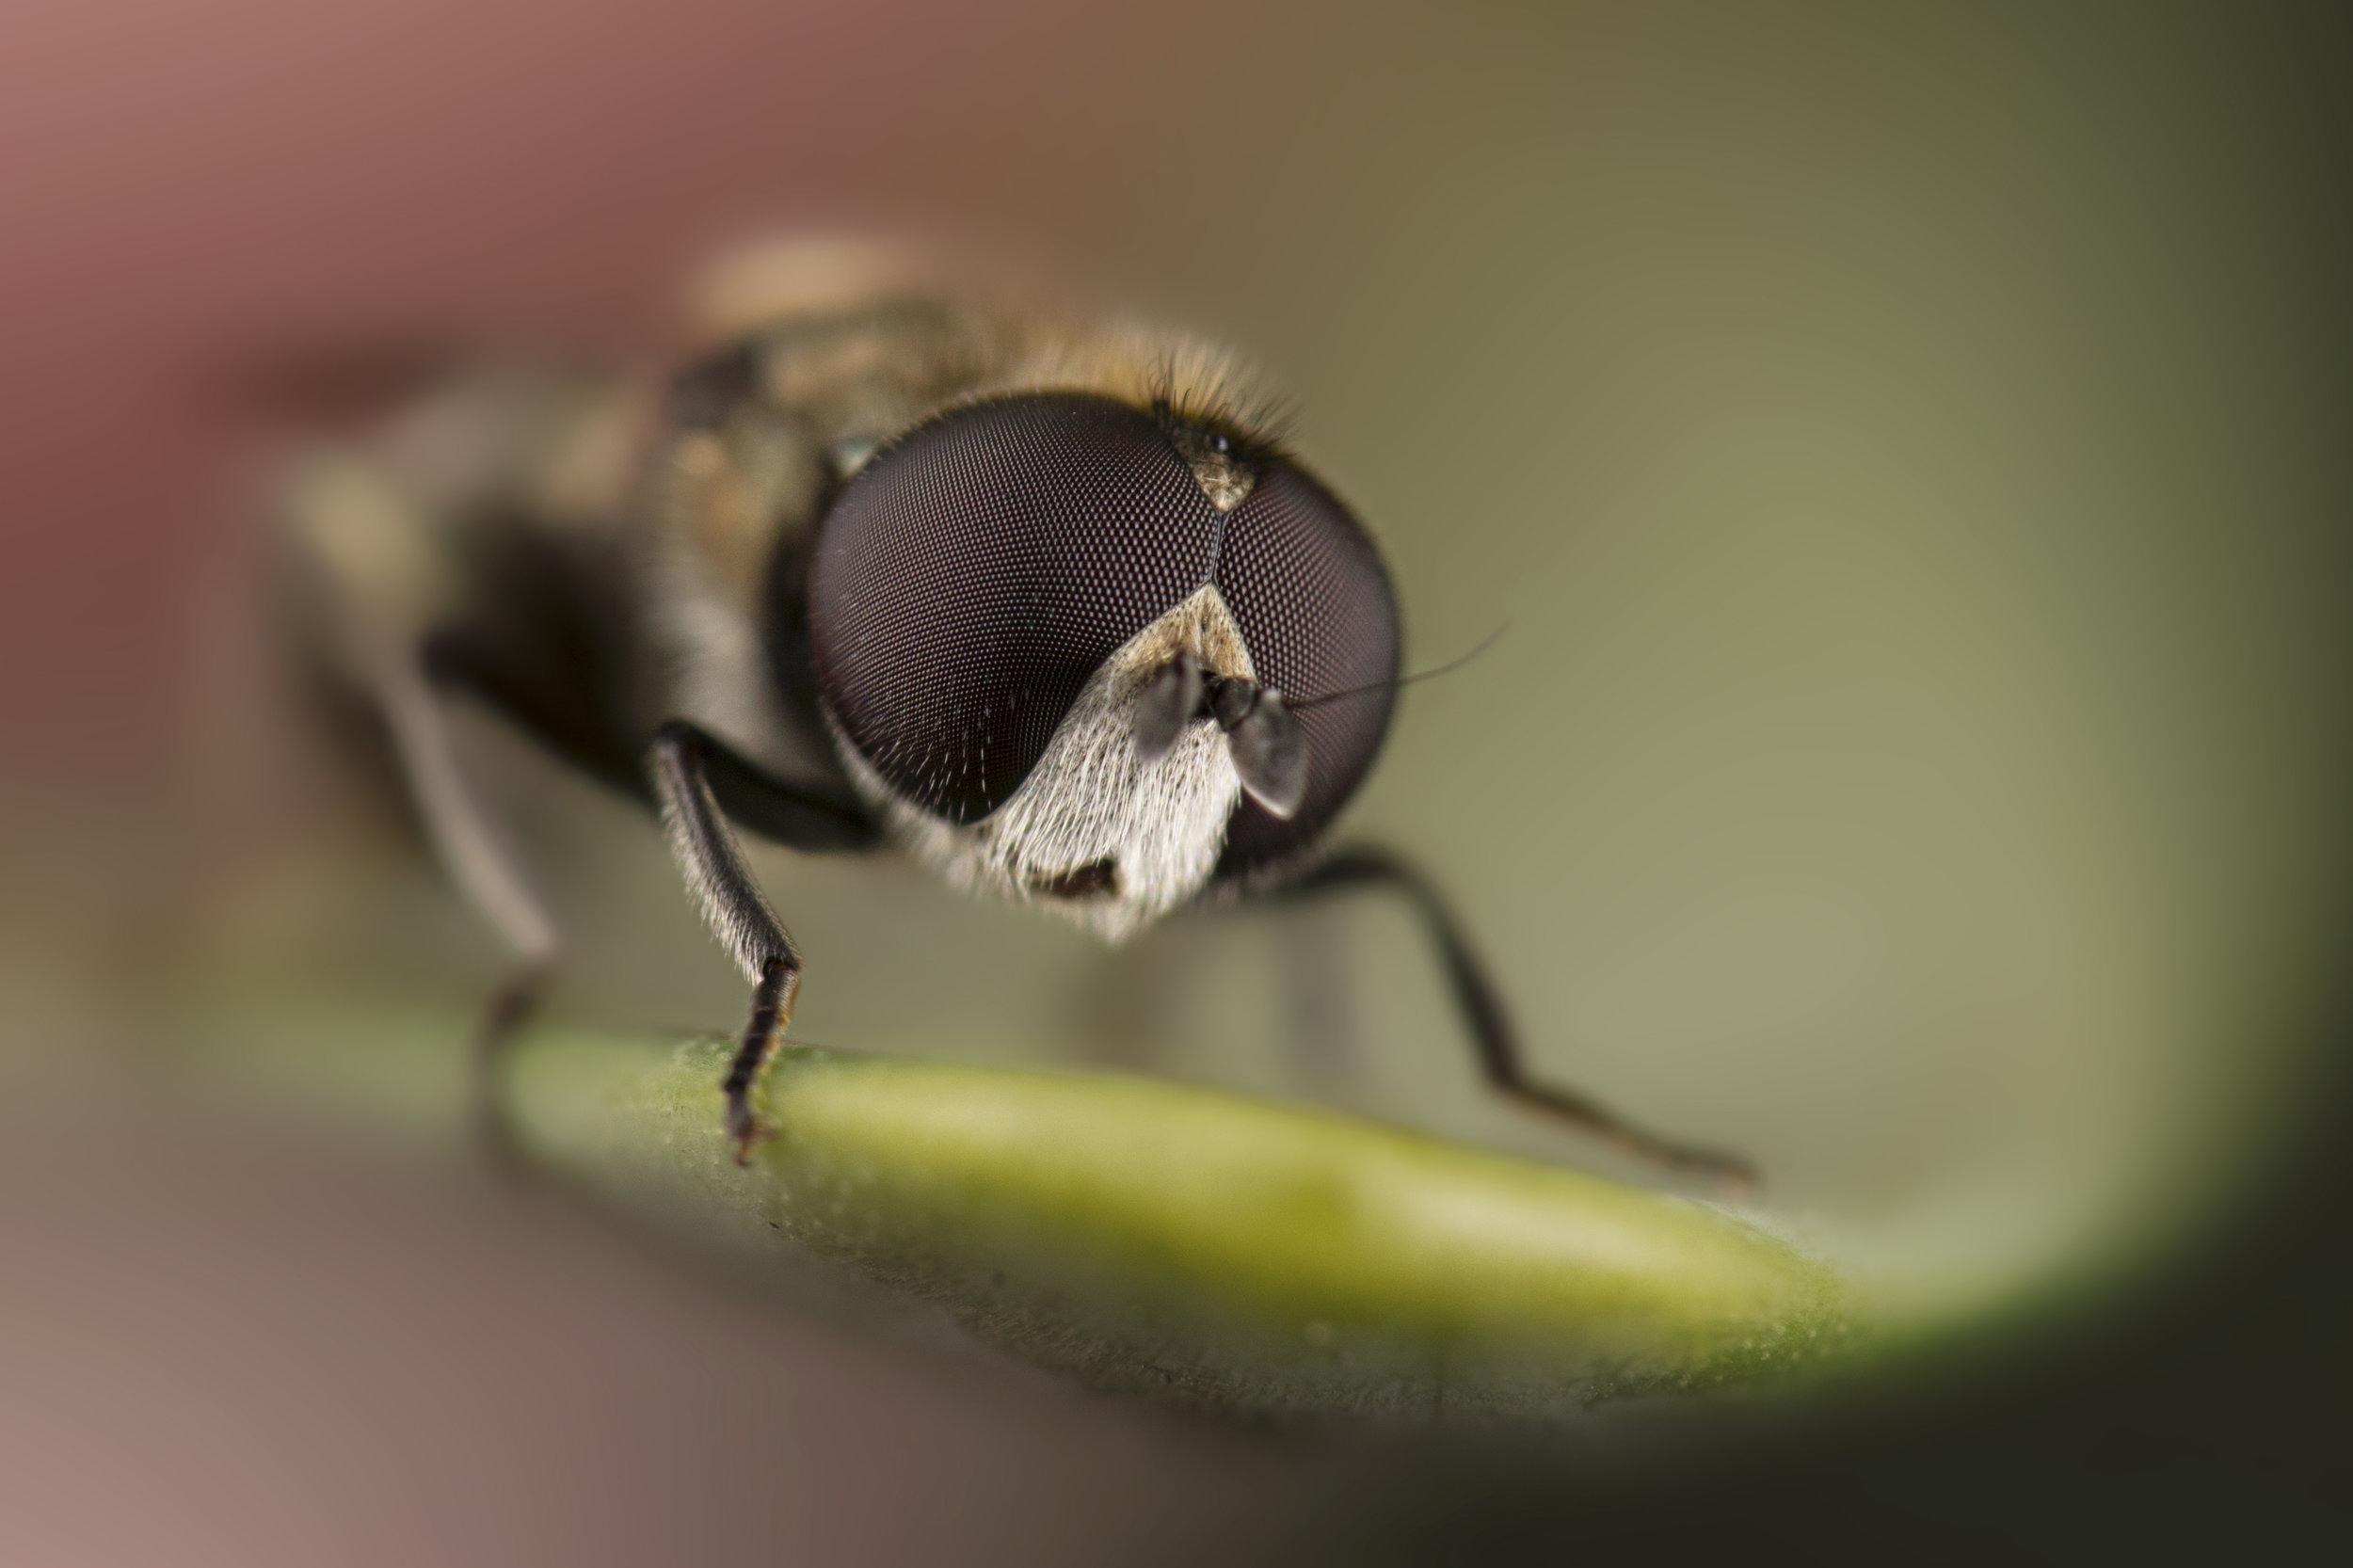 royal-fly.jpg